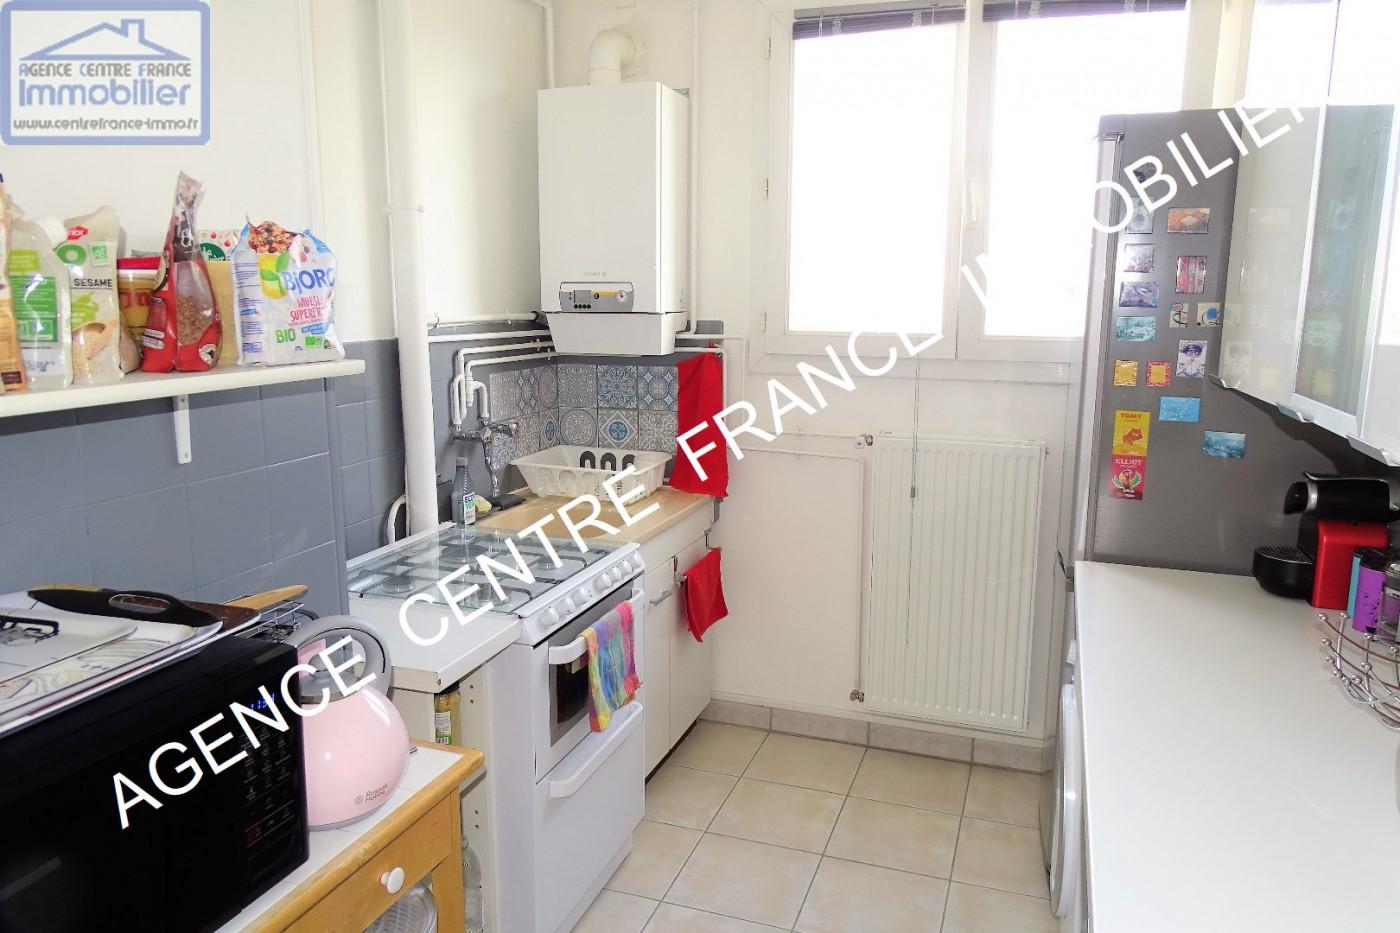 A vendre  Bourges | Réf 03001514 - Agence centre france immobilier